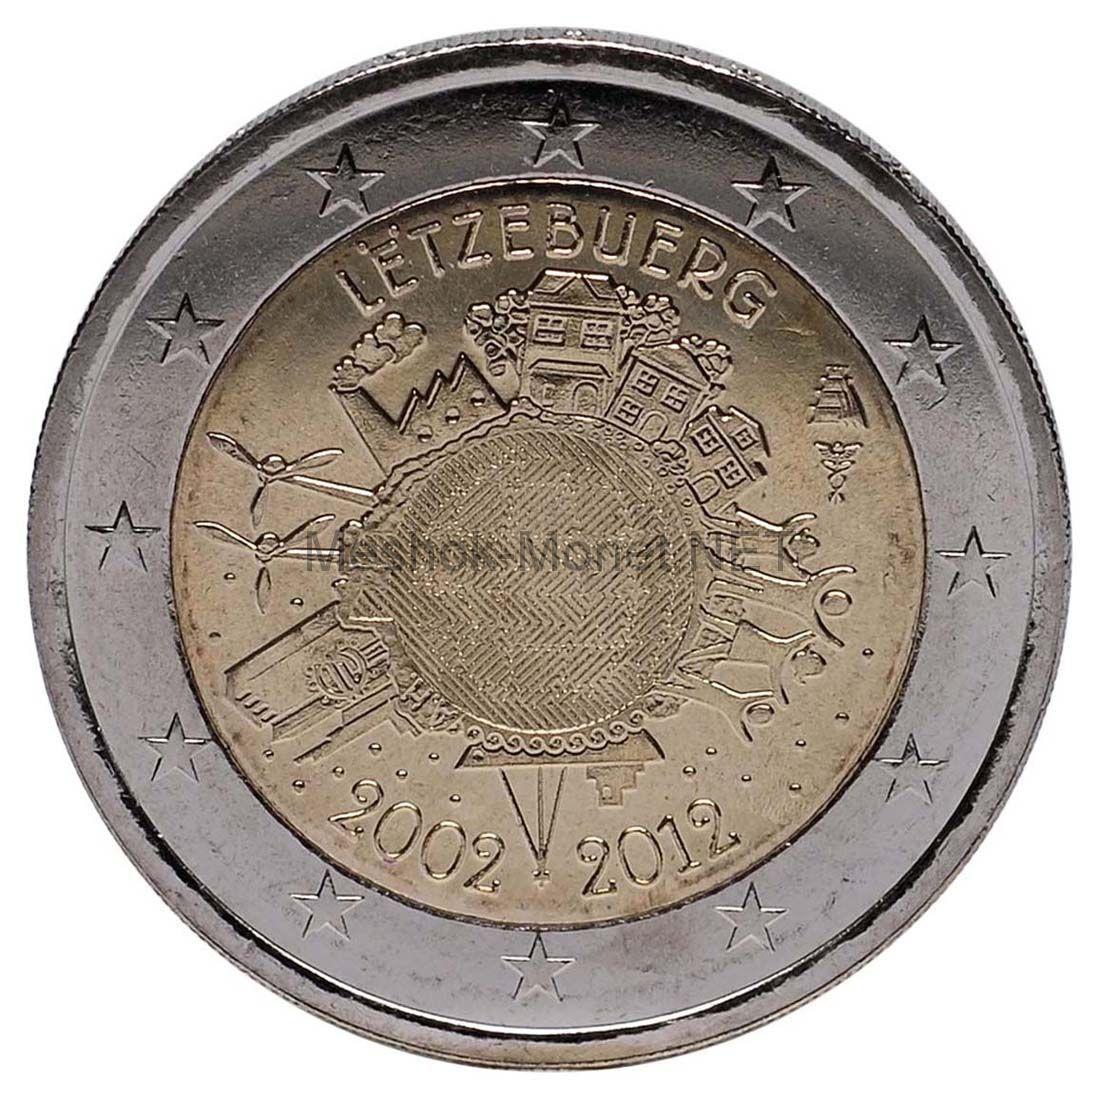 Люксембург 2 евро 2012, 10 лет наличному обращению евро